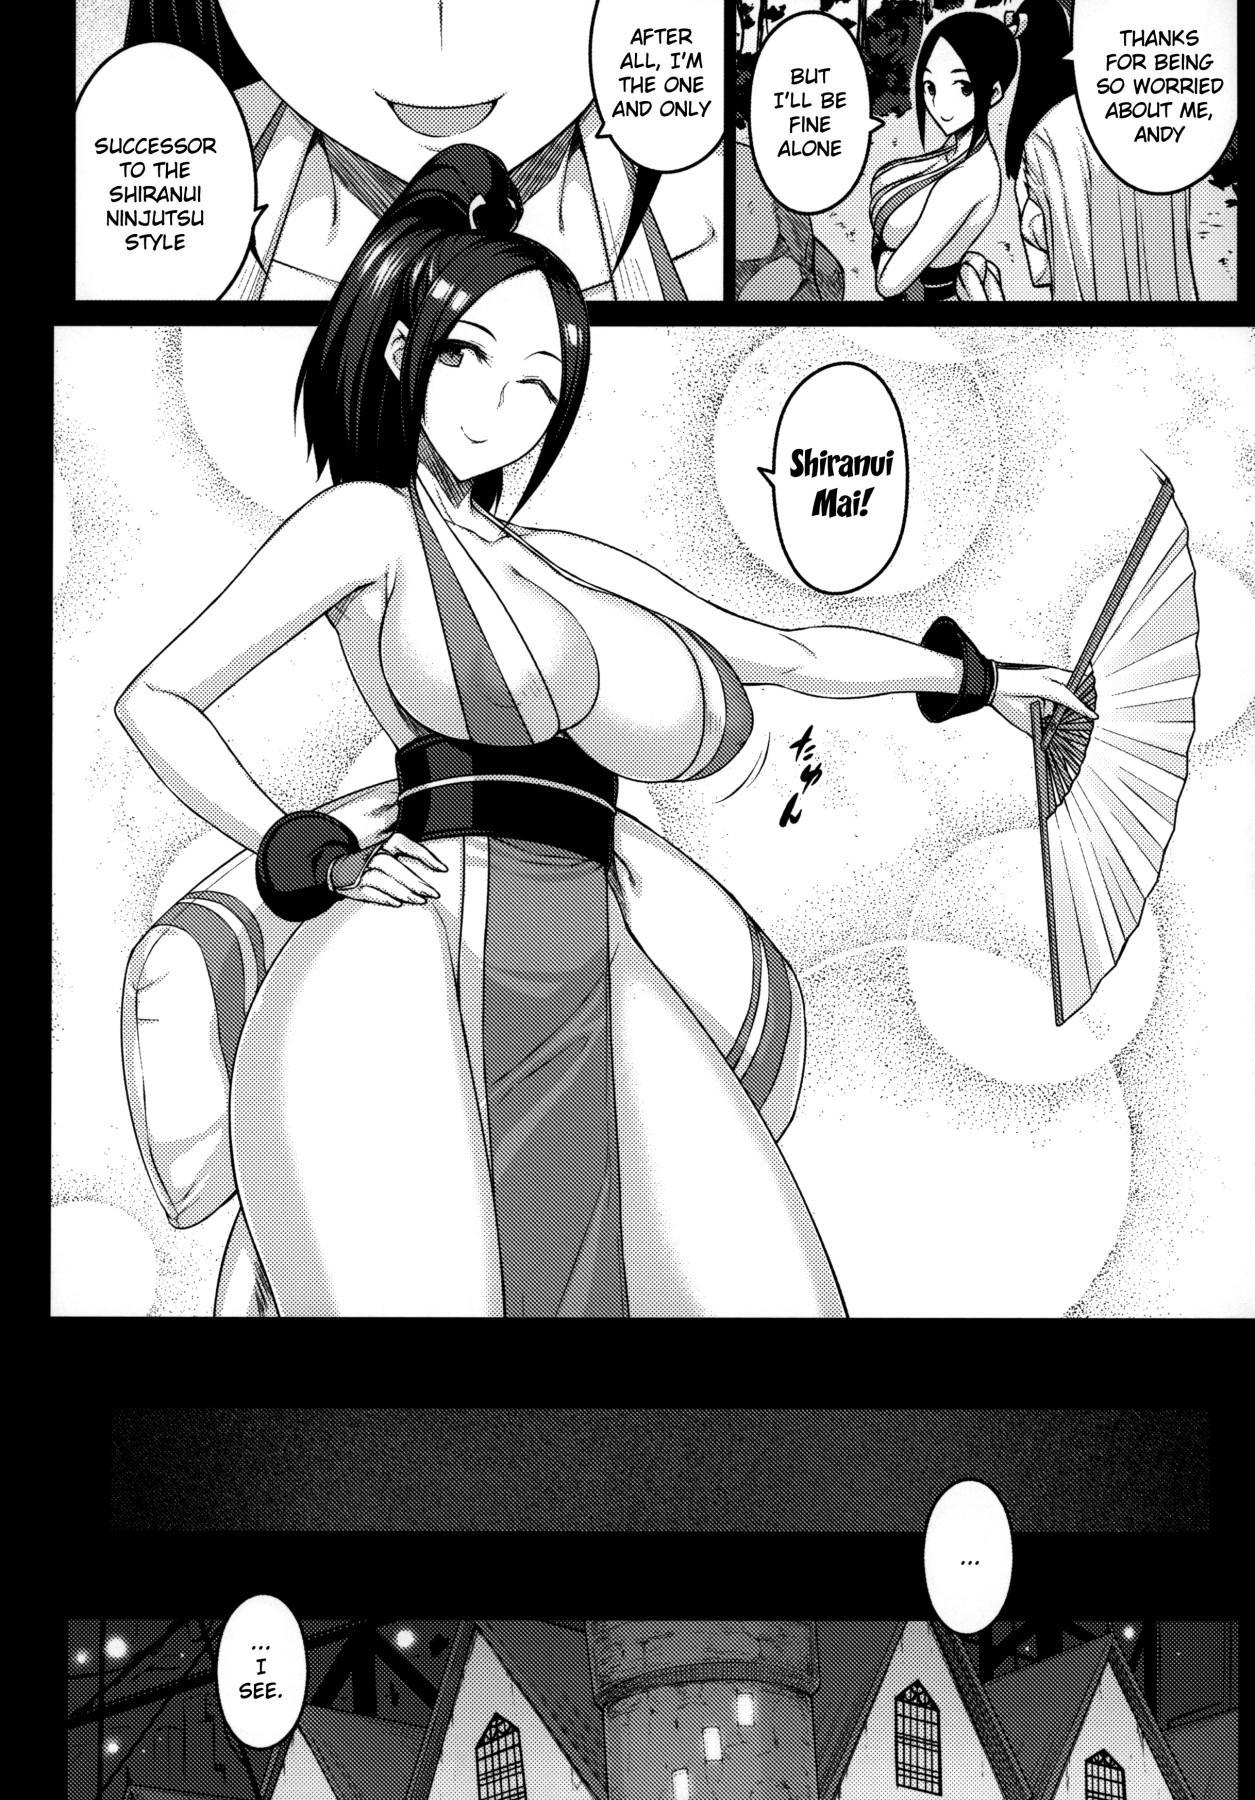 Daraku no hana | Flower of depravity 4